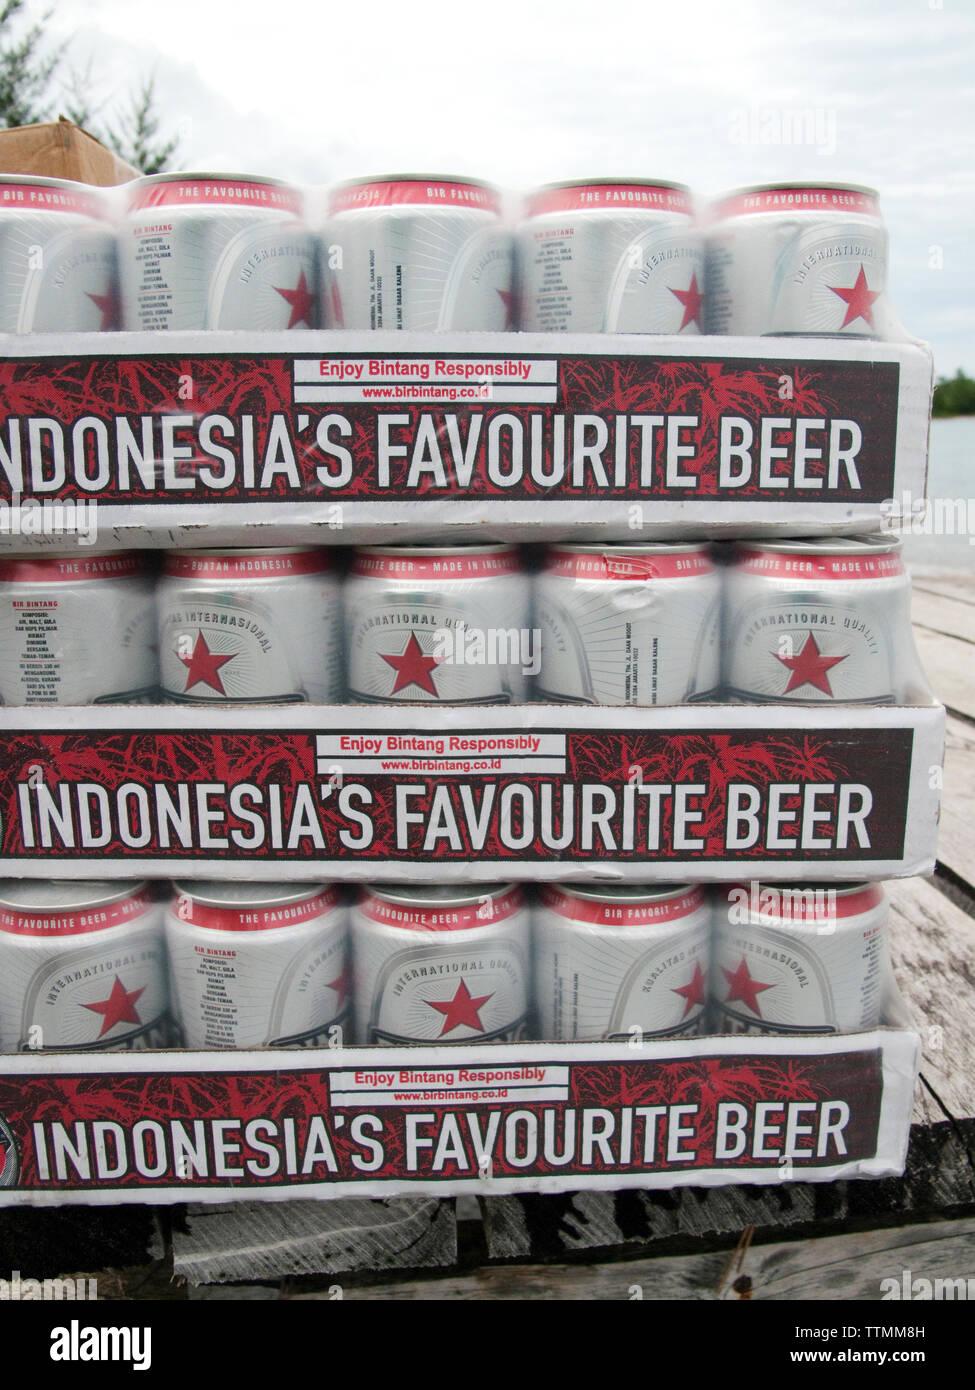 INDONESIA, Mentawai Islands, cases of Bintang beer, Sipora Island - Stock Image